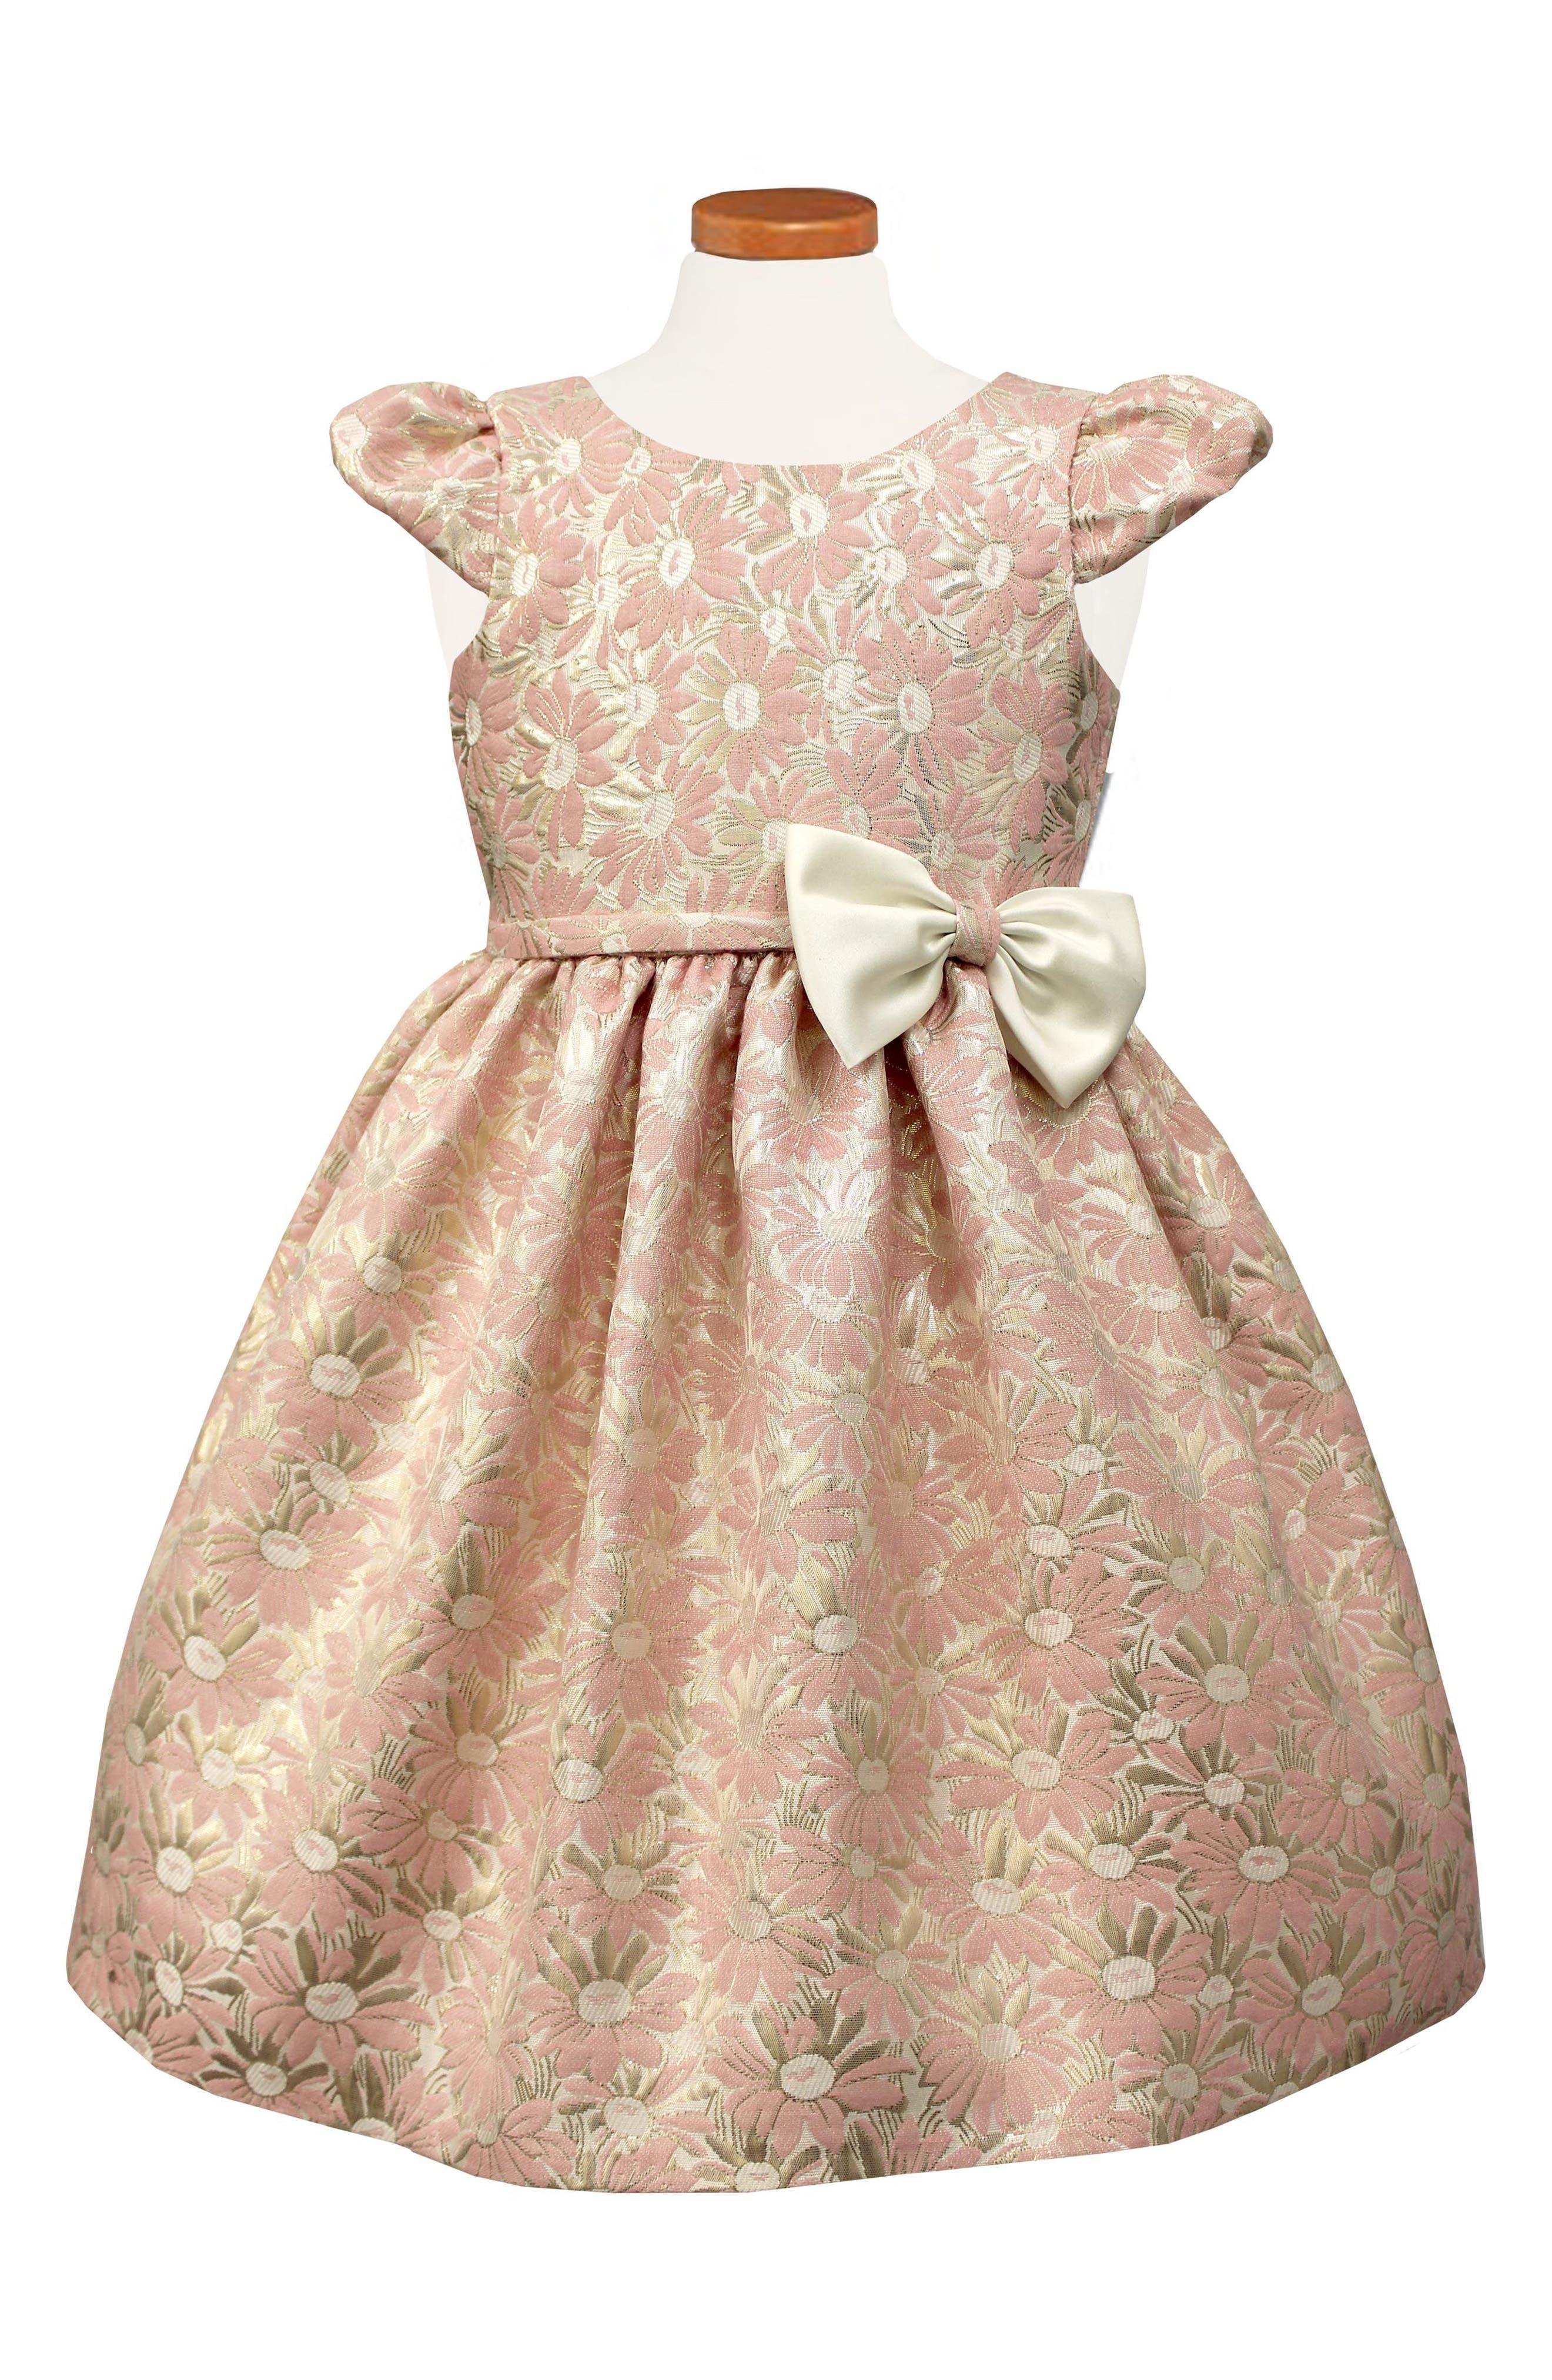 SORBET Floral Jacquard Cap Sleeve Dress